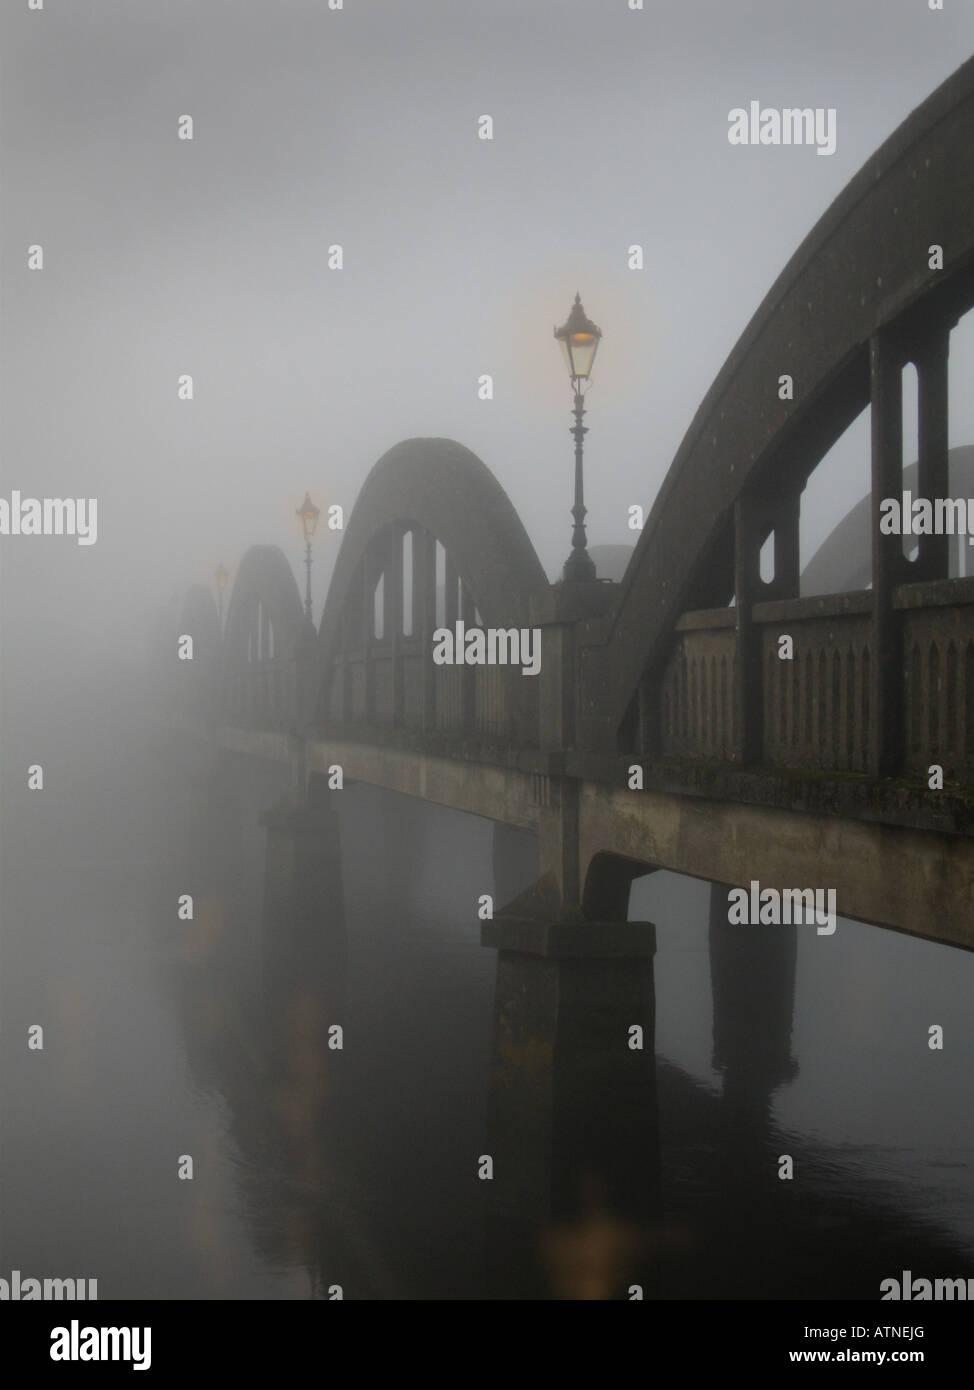 lamplight on foggy bridge - Stock Image